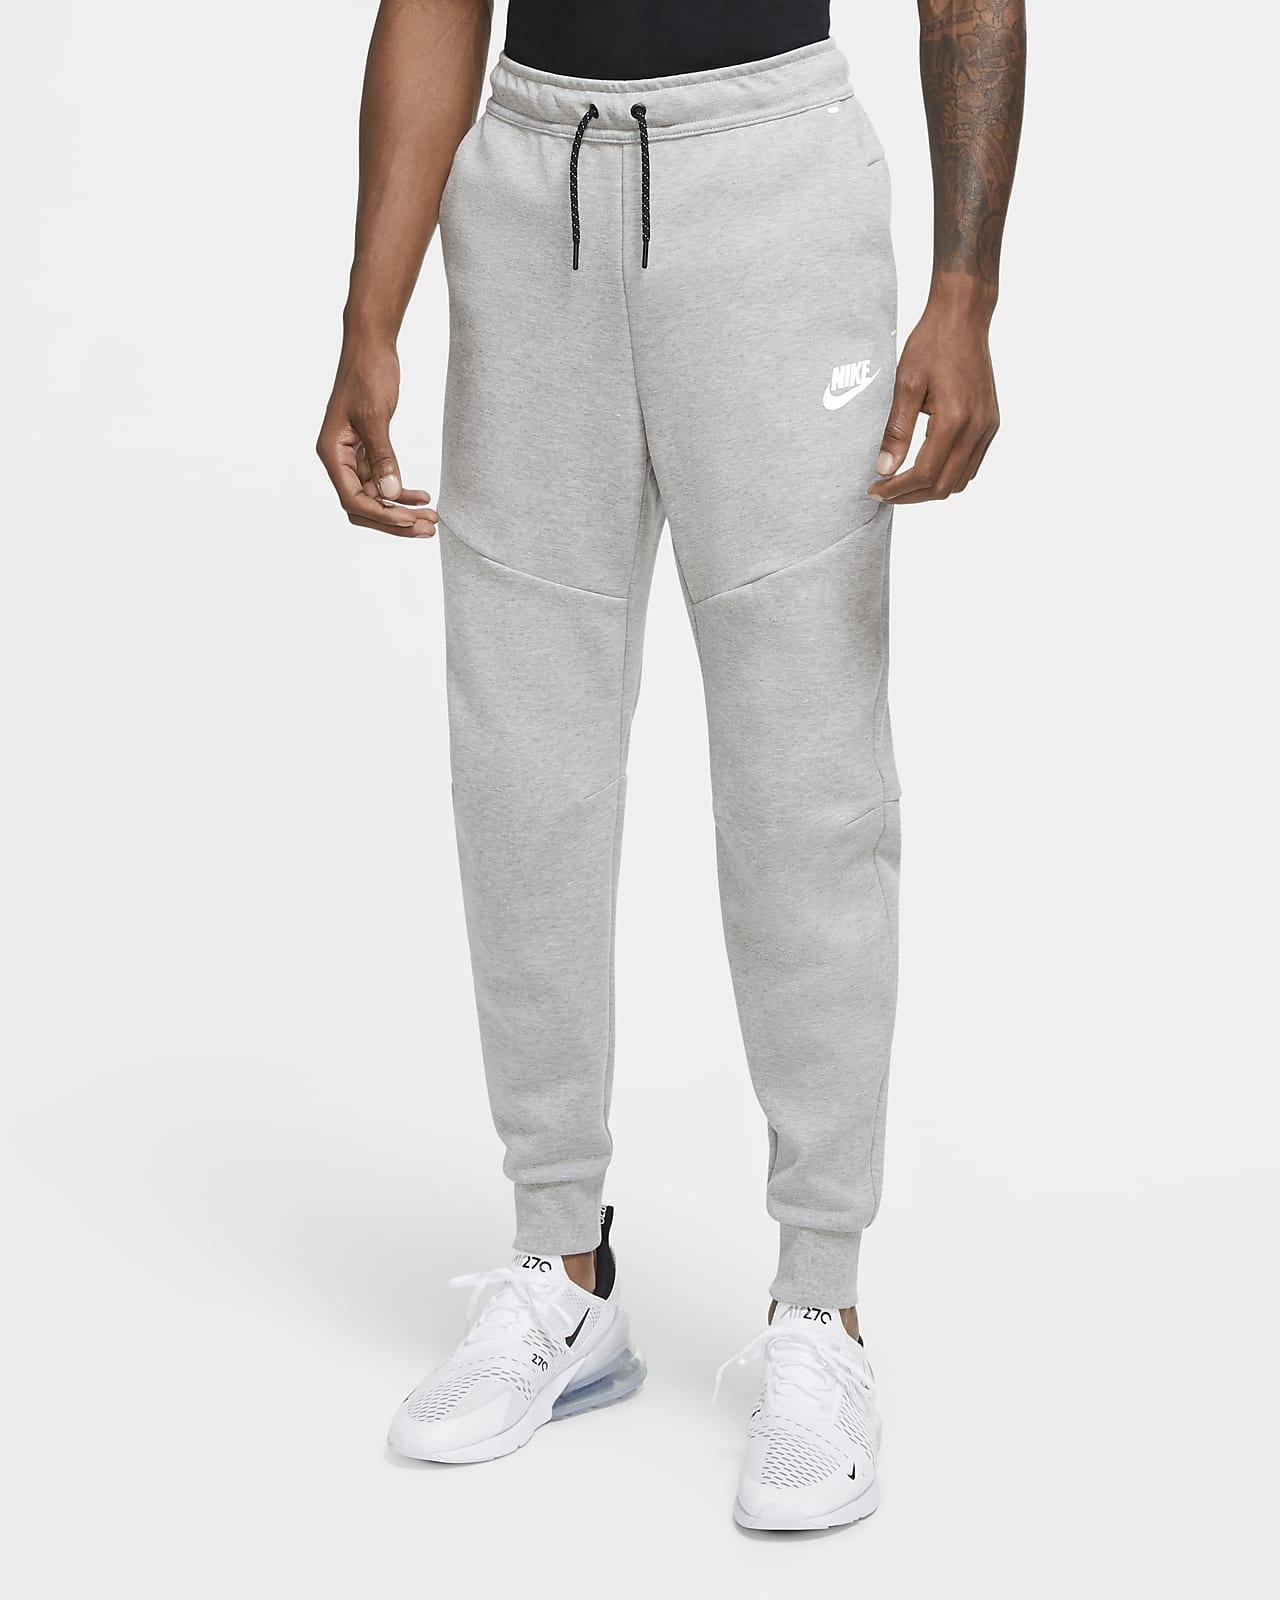 Pantalones Deportivos Para Hombre Nike Sportswear Tech Fleece Nike Cl